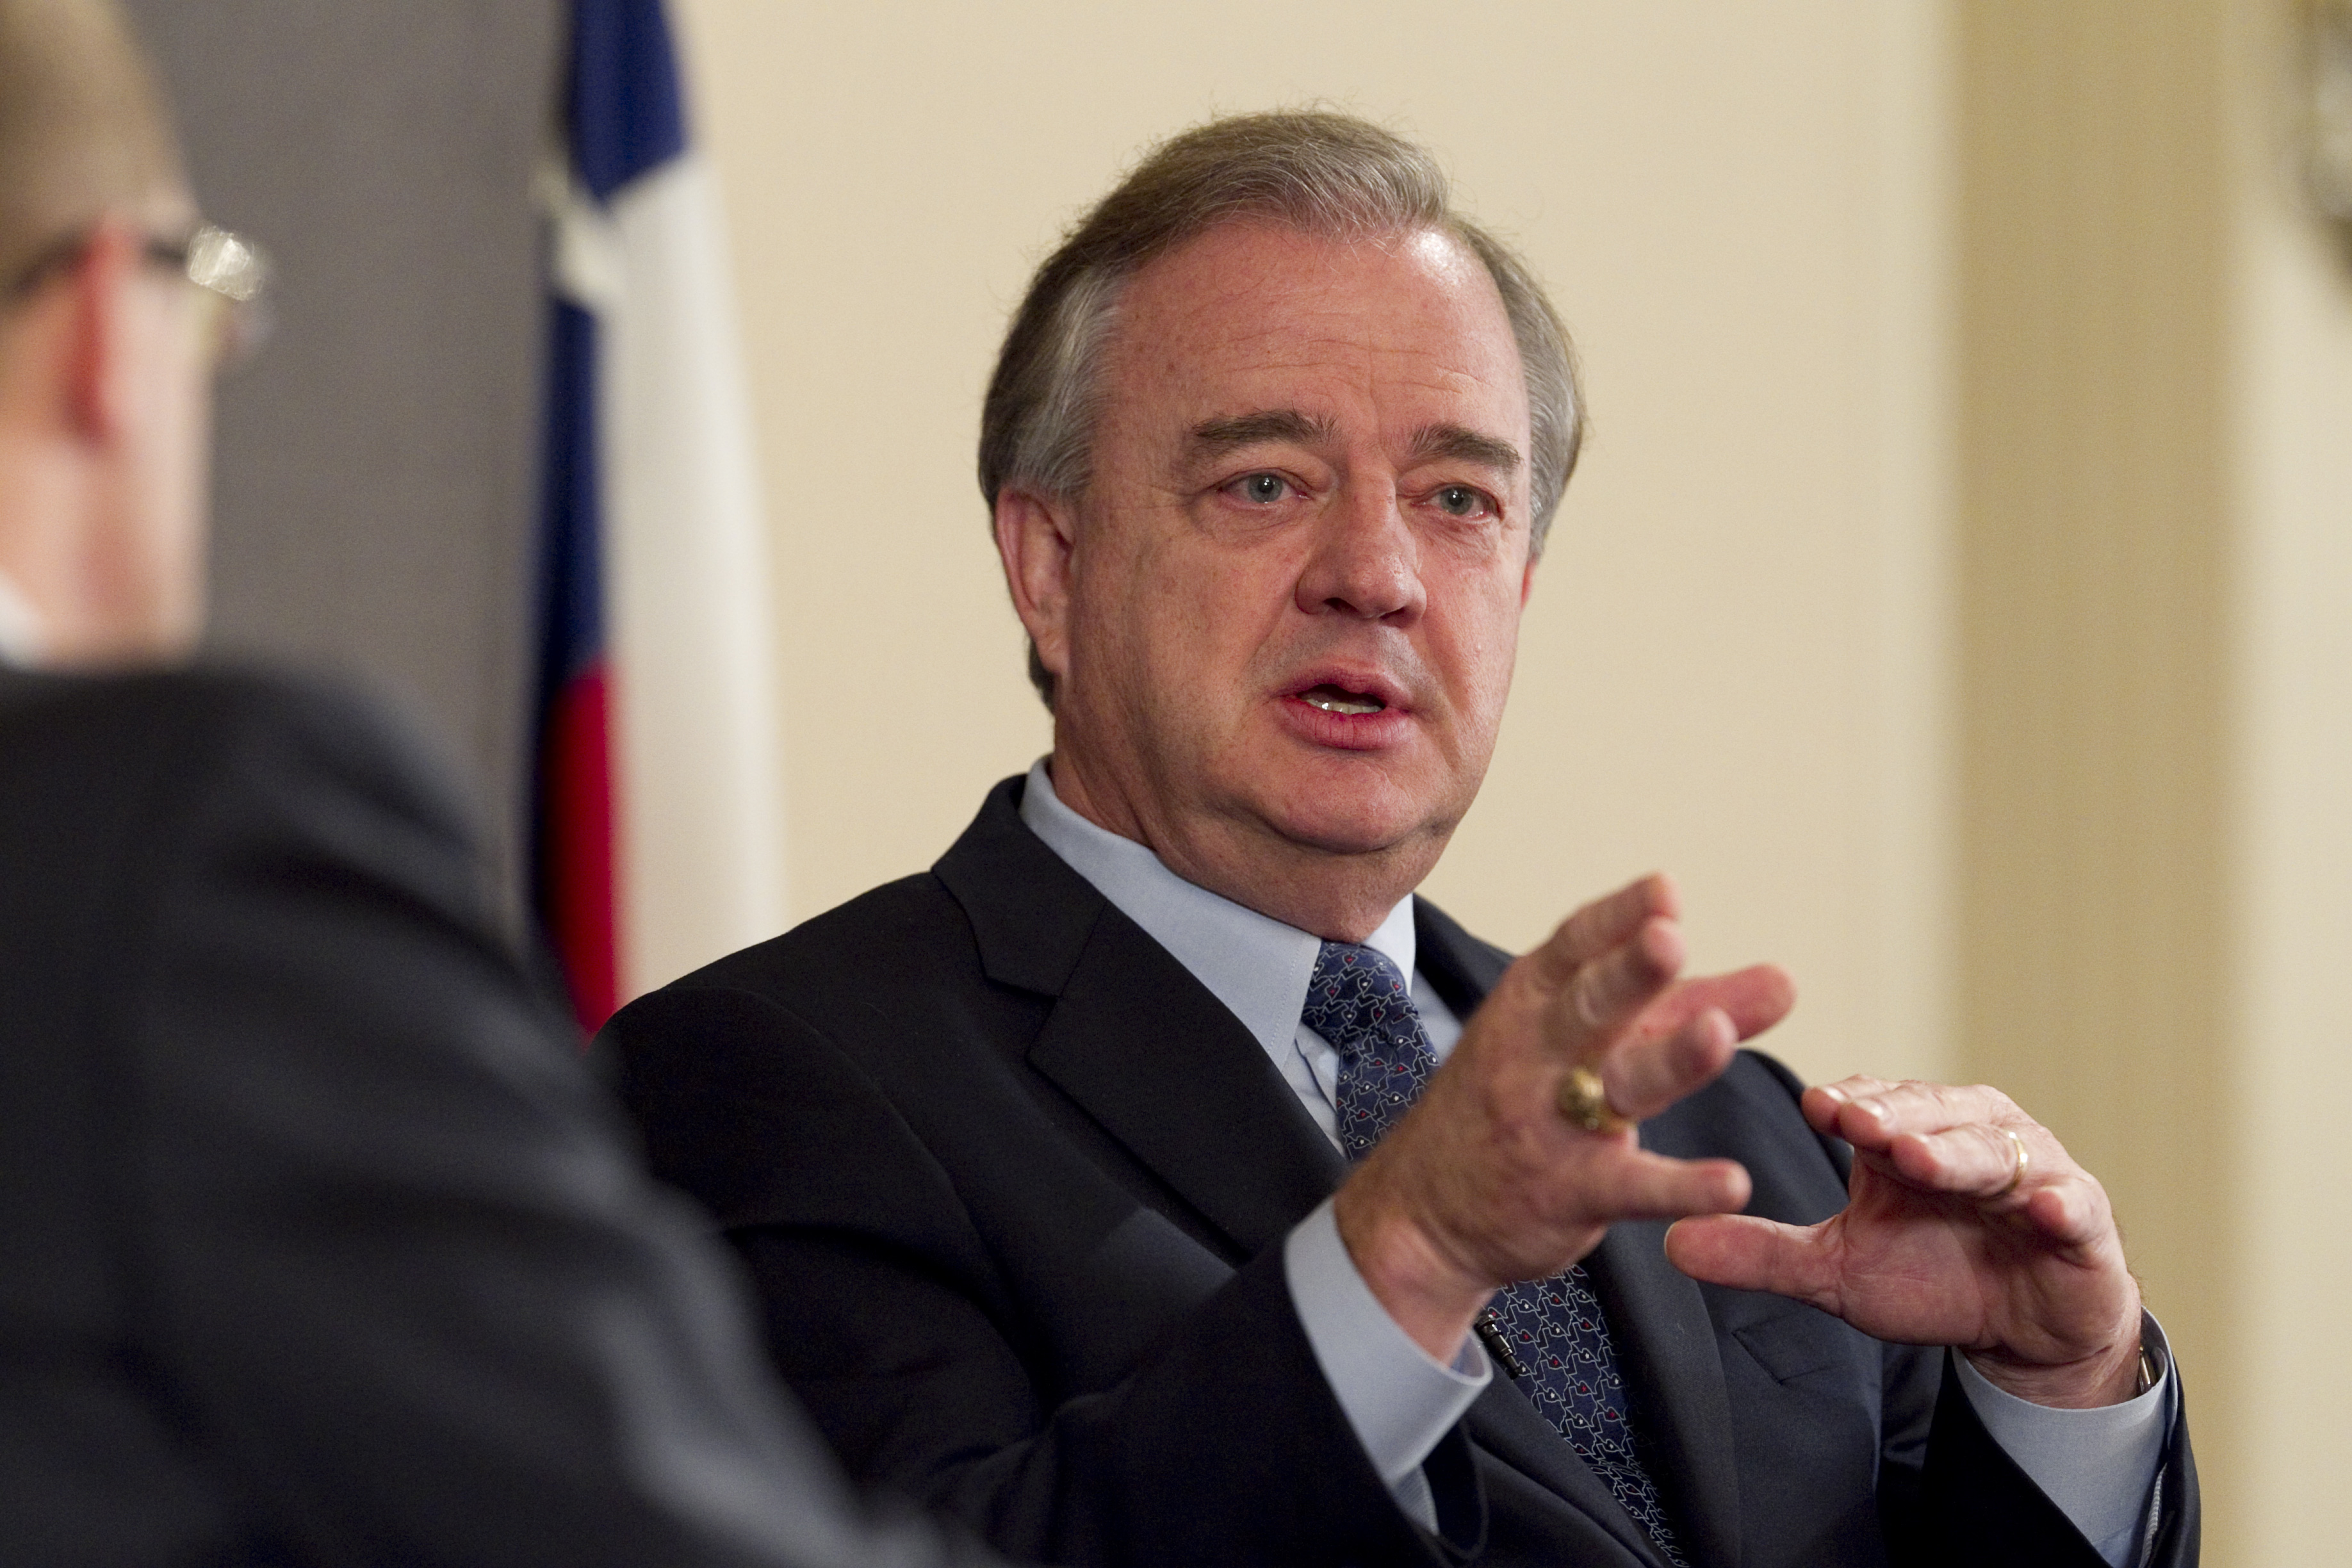 Texas A&M University Chancellor John Sharp